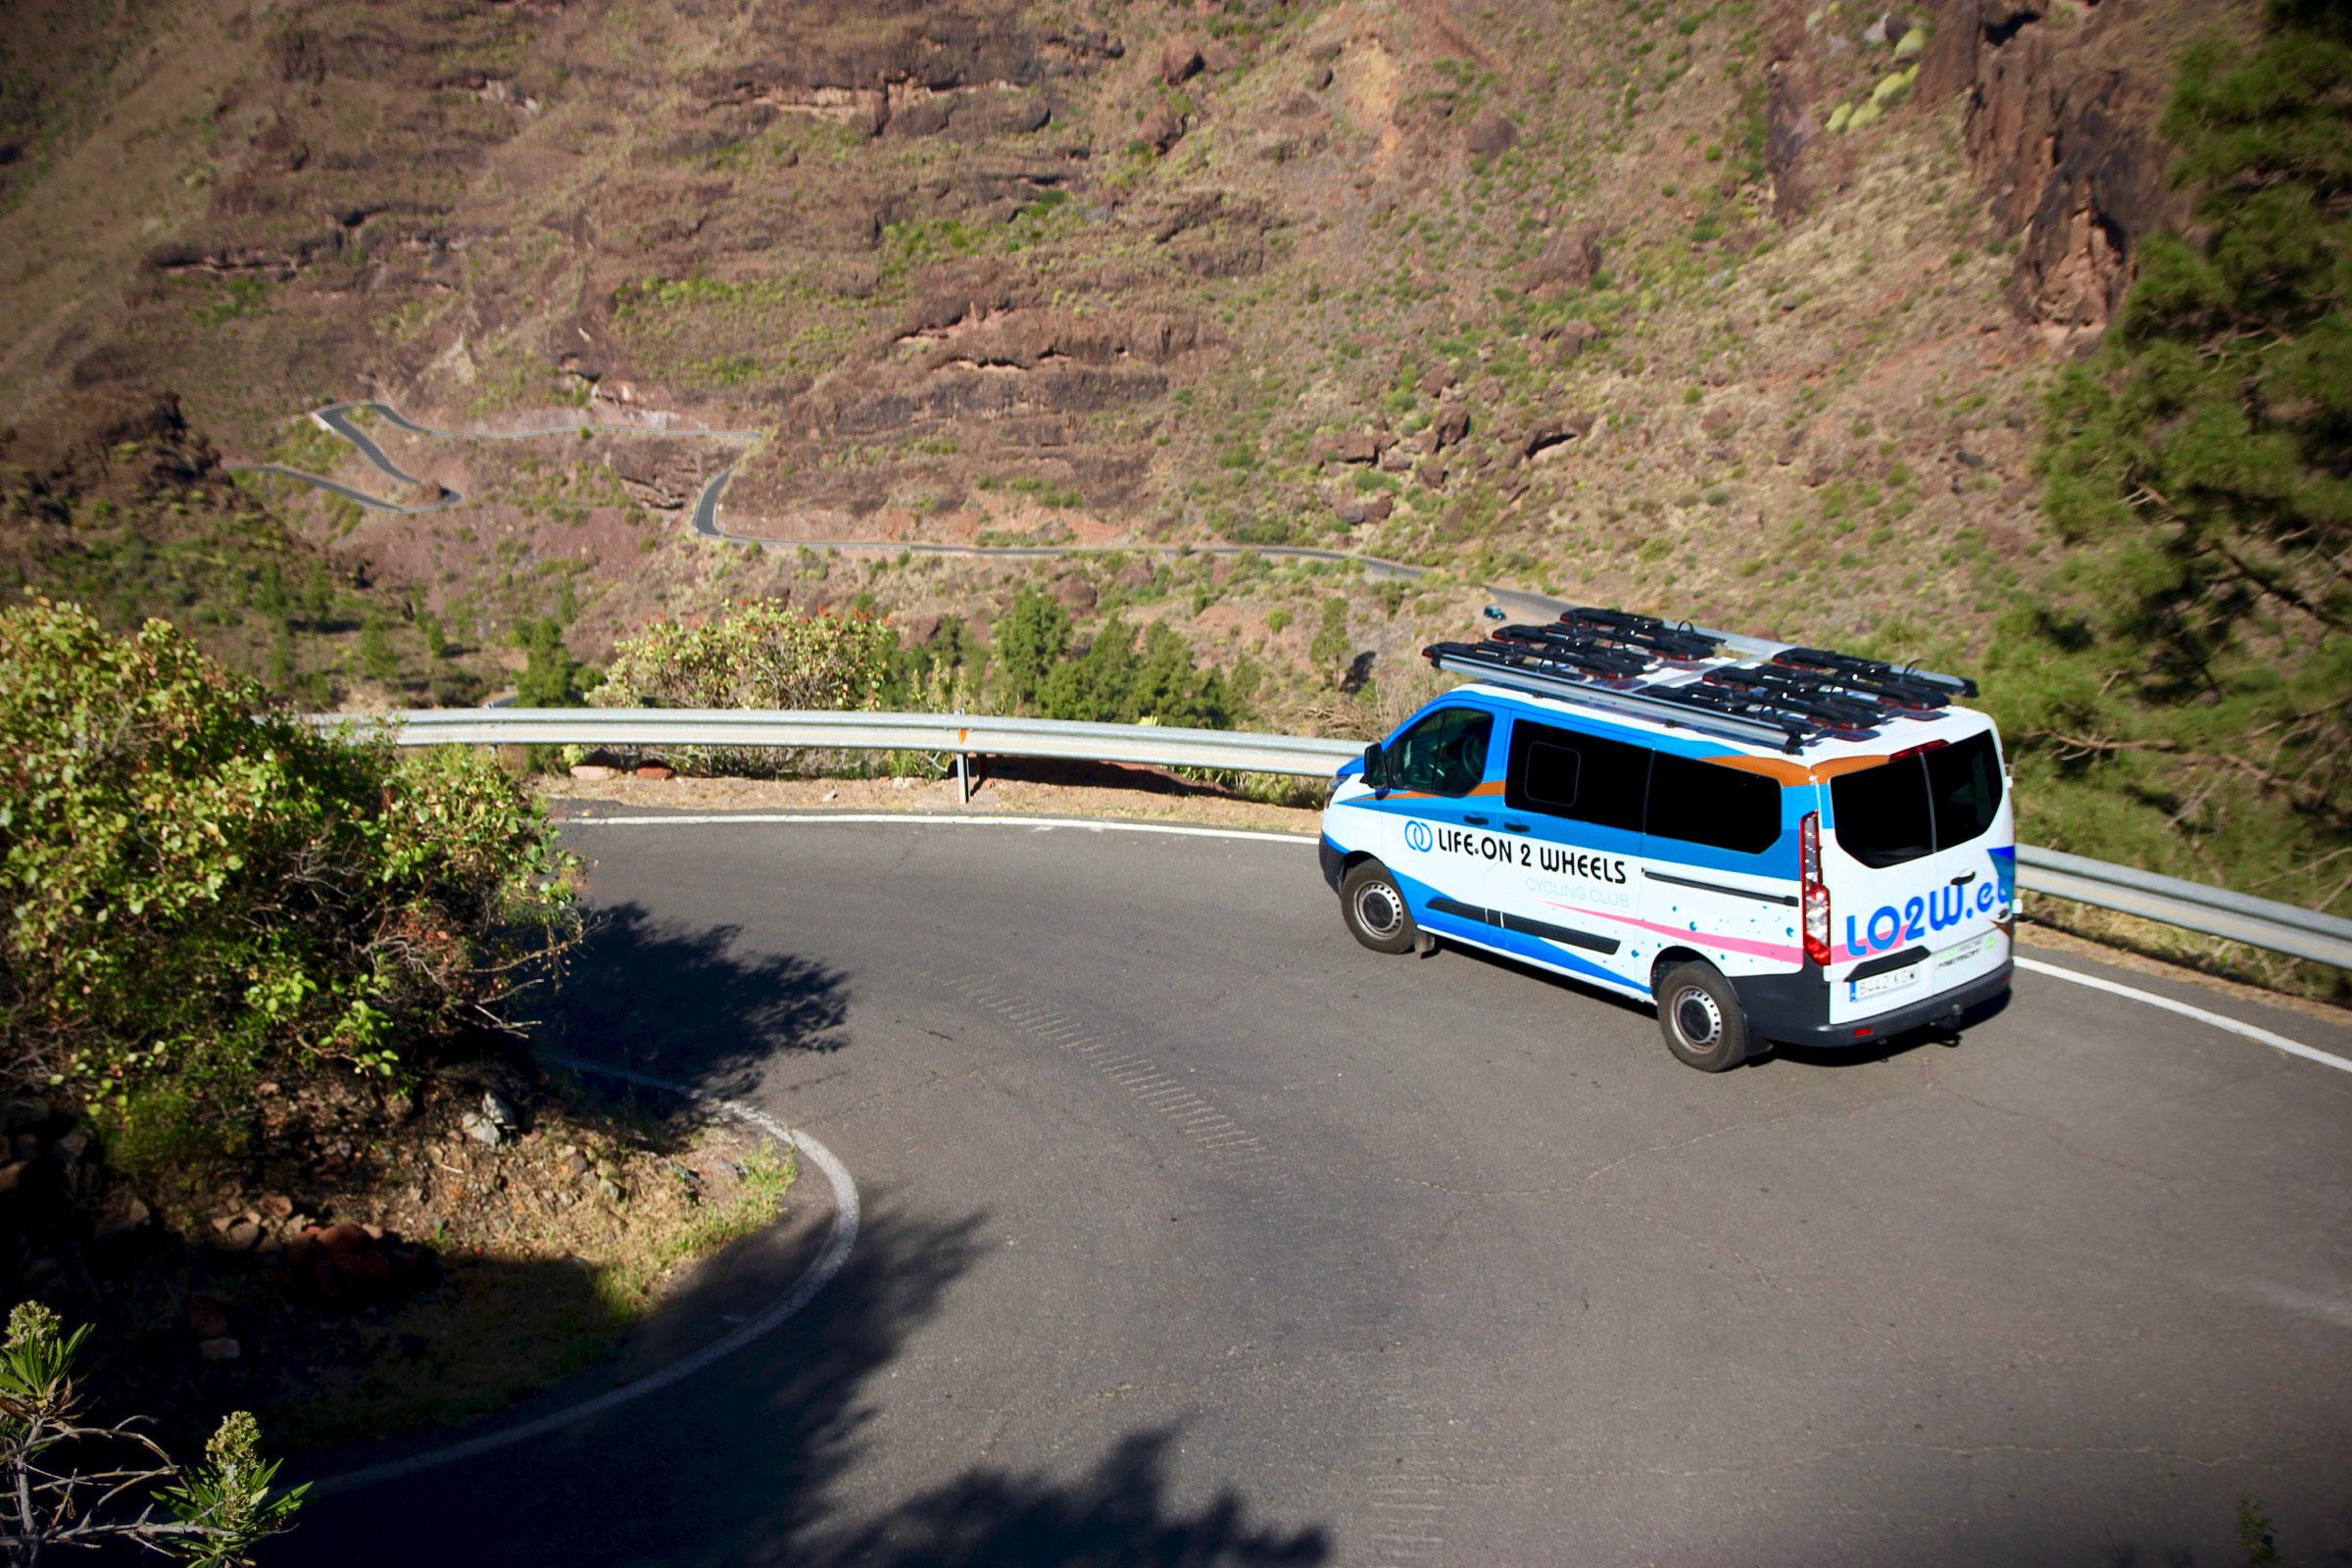 Life On 2 Wheels - Bike Shuttle